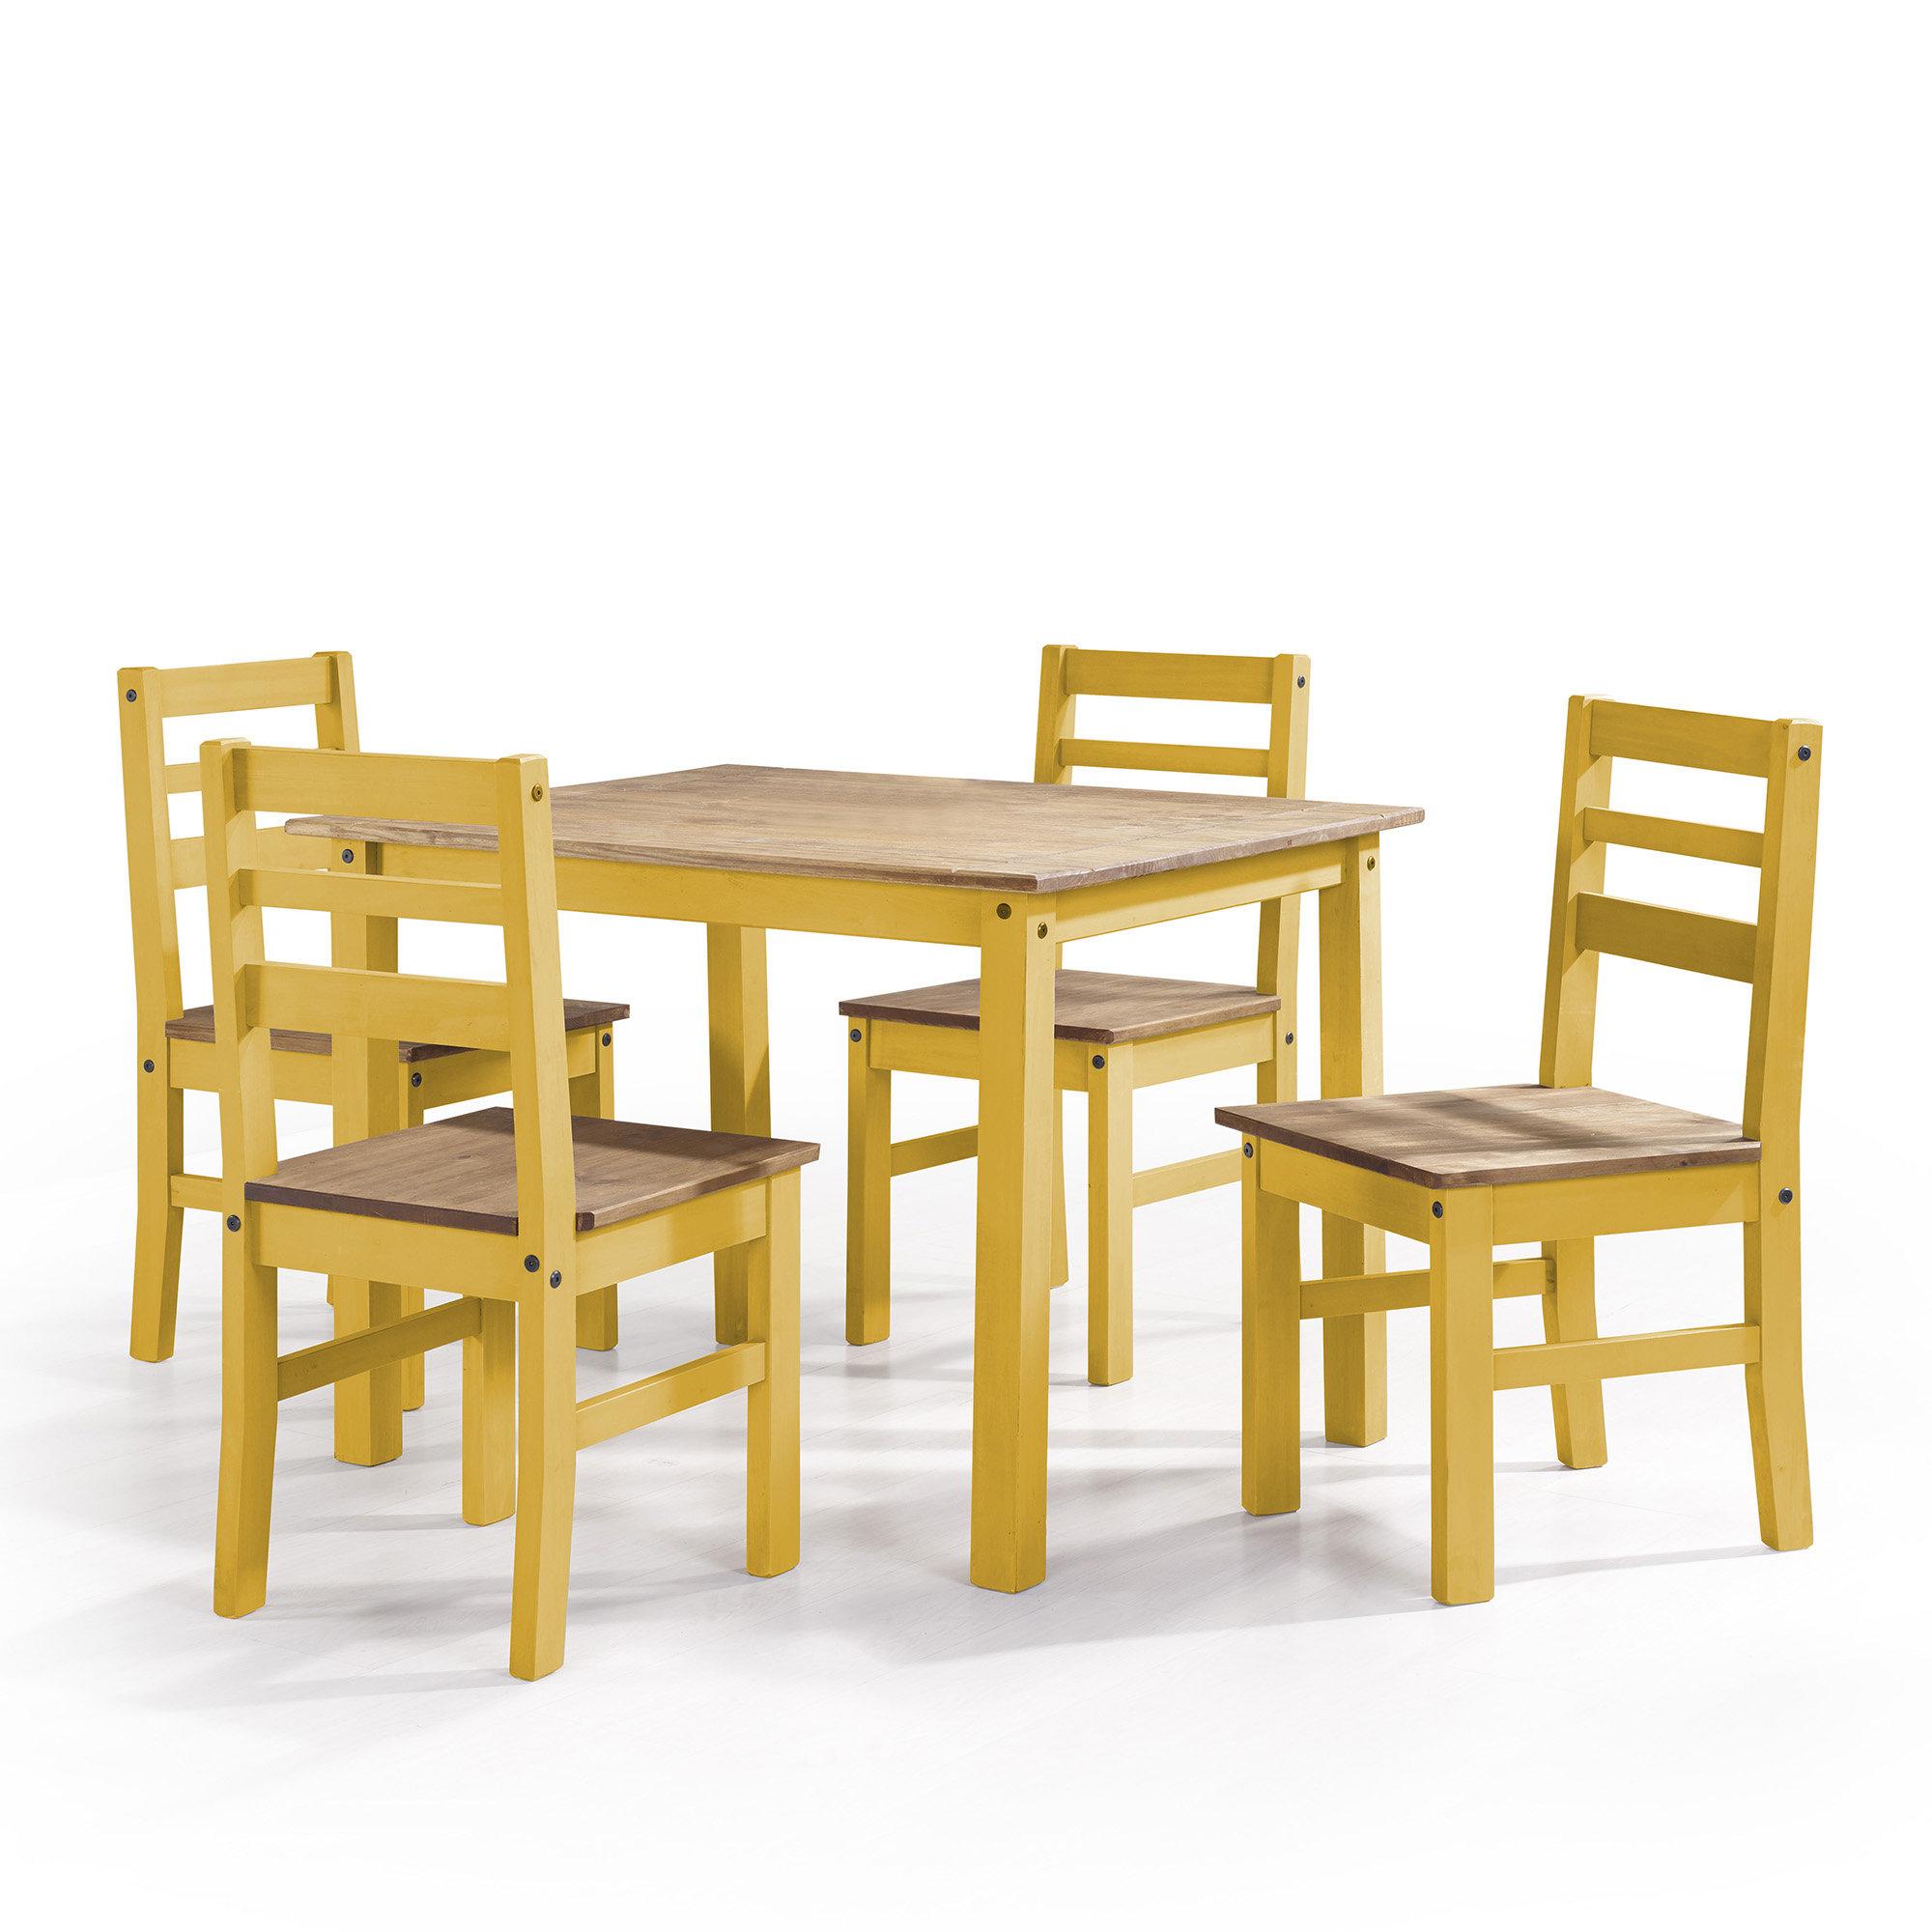 Shrewsbury 5 Piece Solid Wood Dining Set Regarding Recent Yedinak 5 Piece Solid Wood Dining Sets (View 2 of 20)